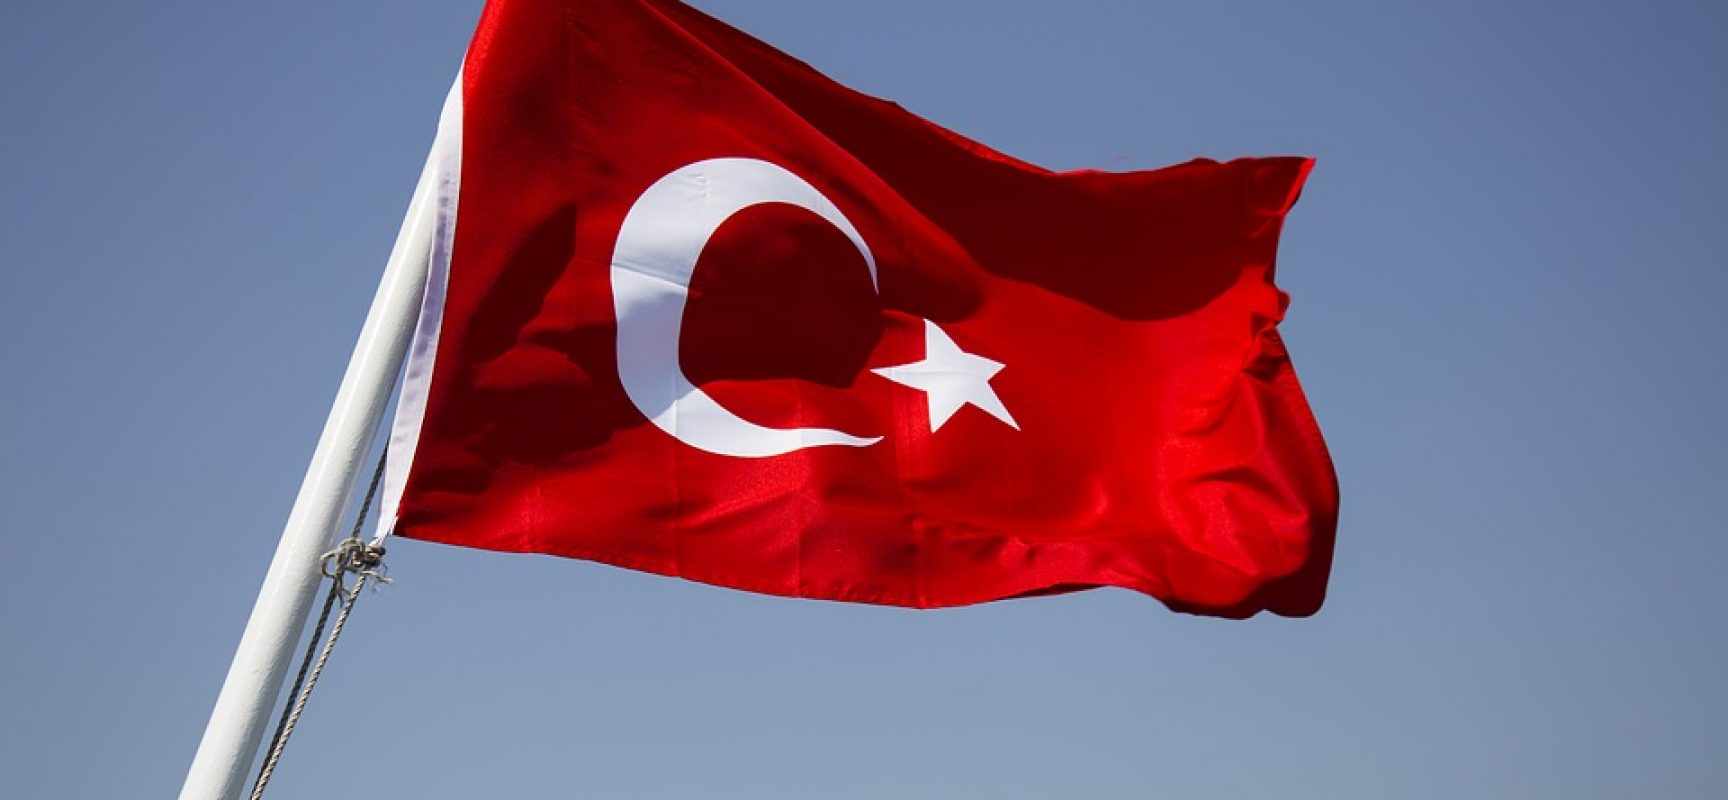 Turcja koniem trojańskim NATO?